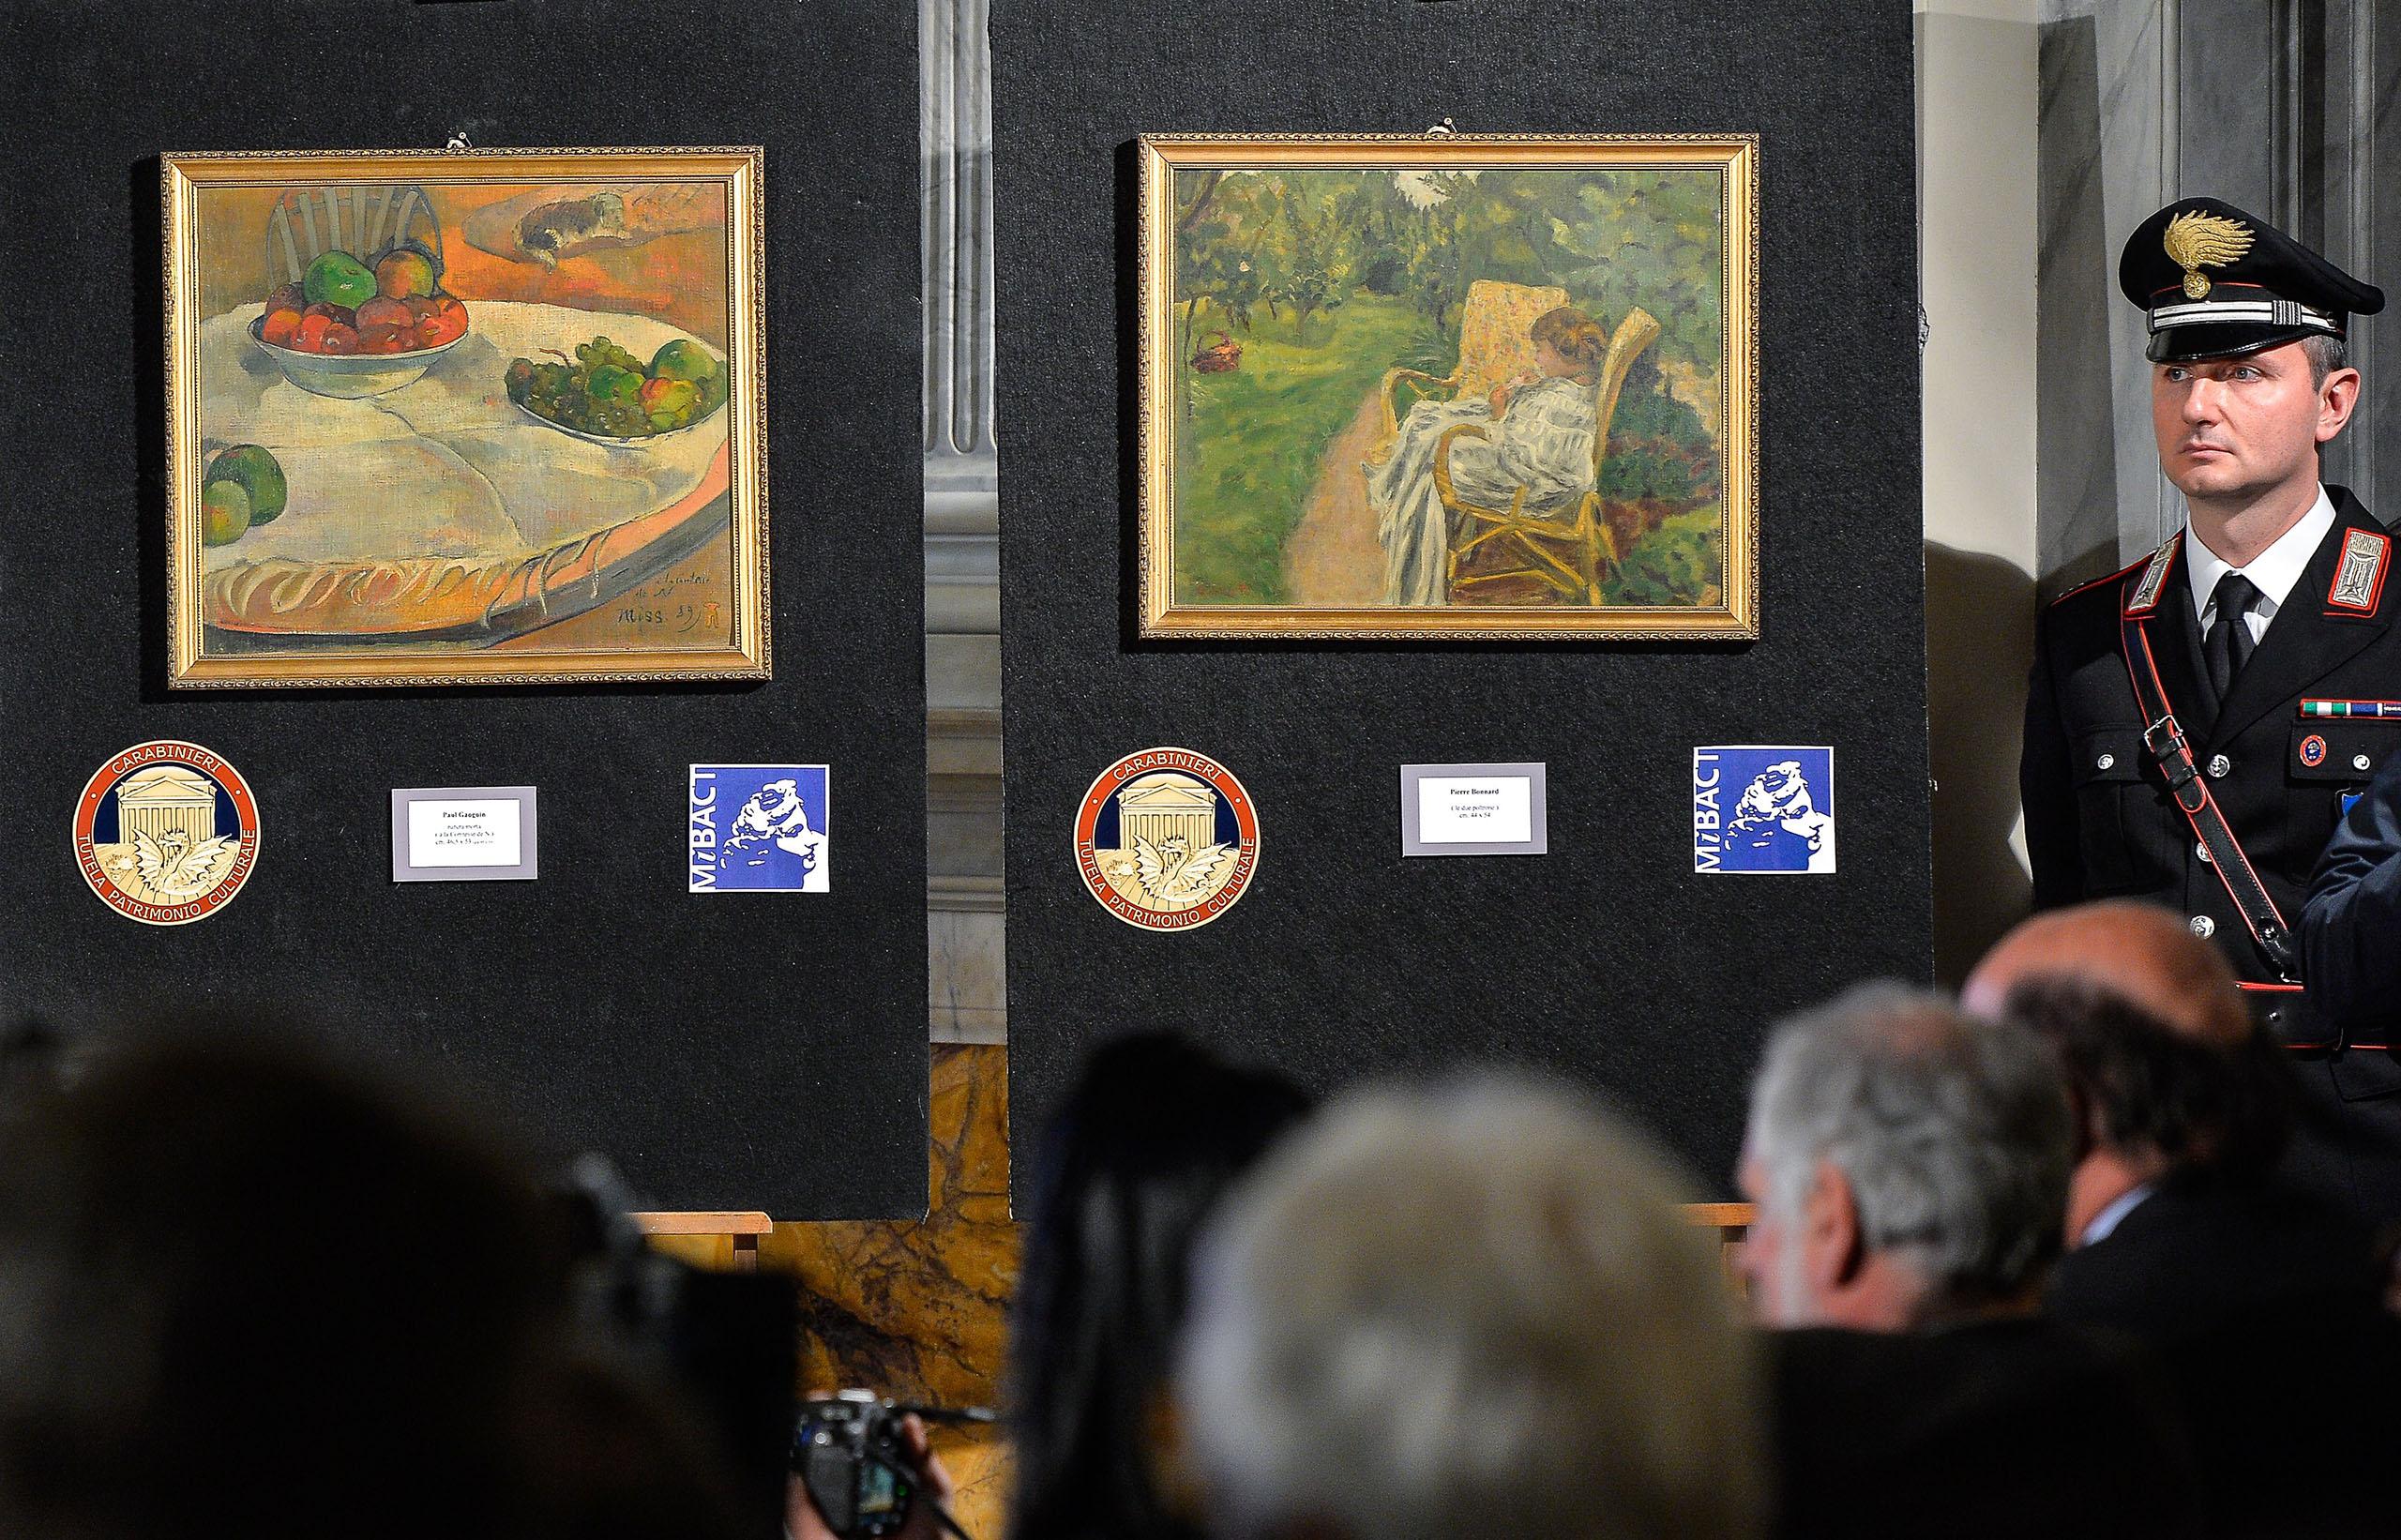 A Carabinieri stands next to the two paintings stolen in London in the 1970s,  Fruits sur une table ou nature morte au petit chien  by French artist Paul Gauguin and  La femme aux deux fauteuils  by Pierre Bonnard, on April 2, 2014.